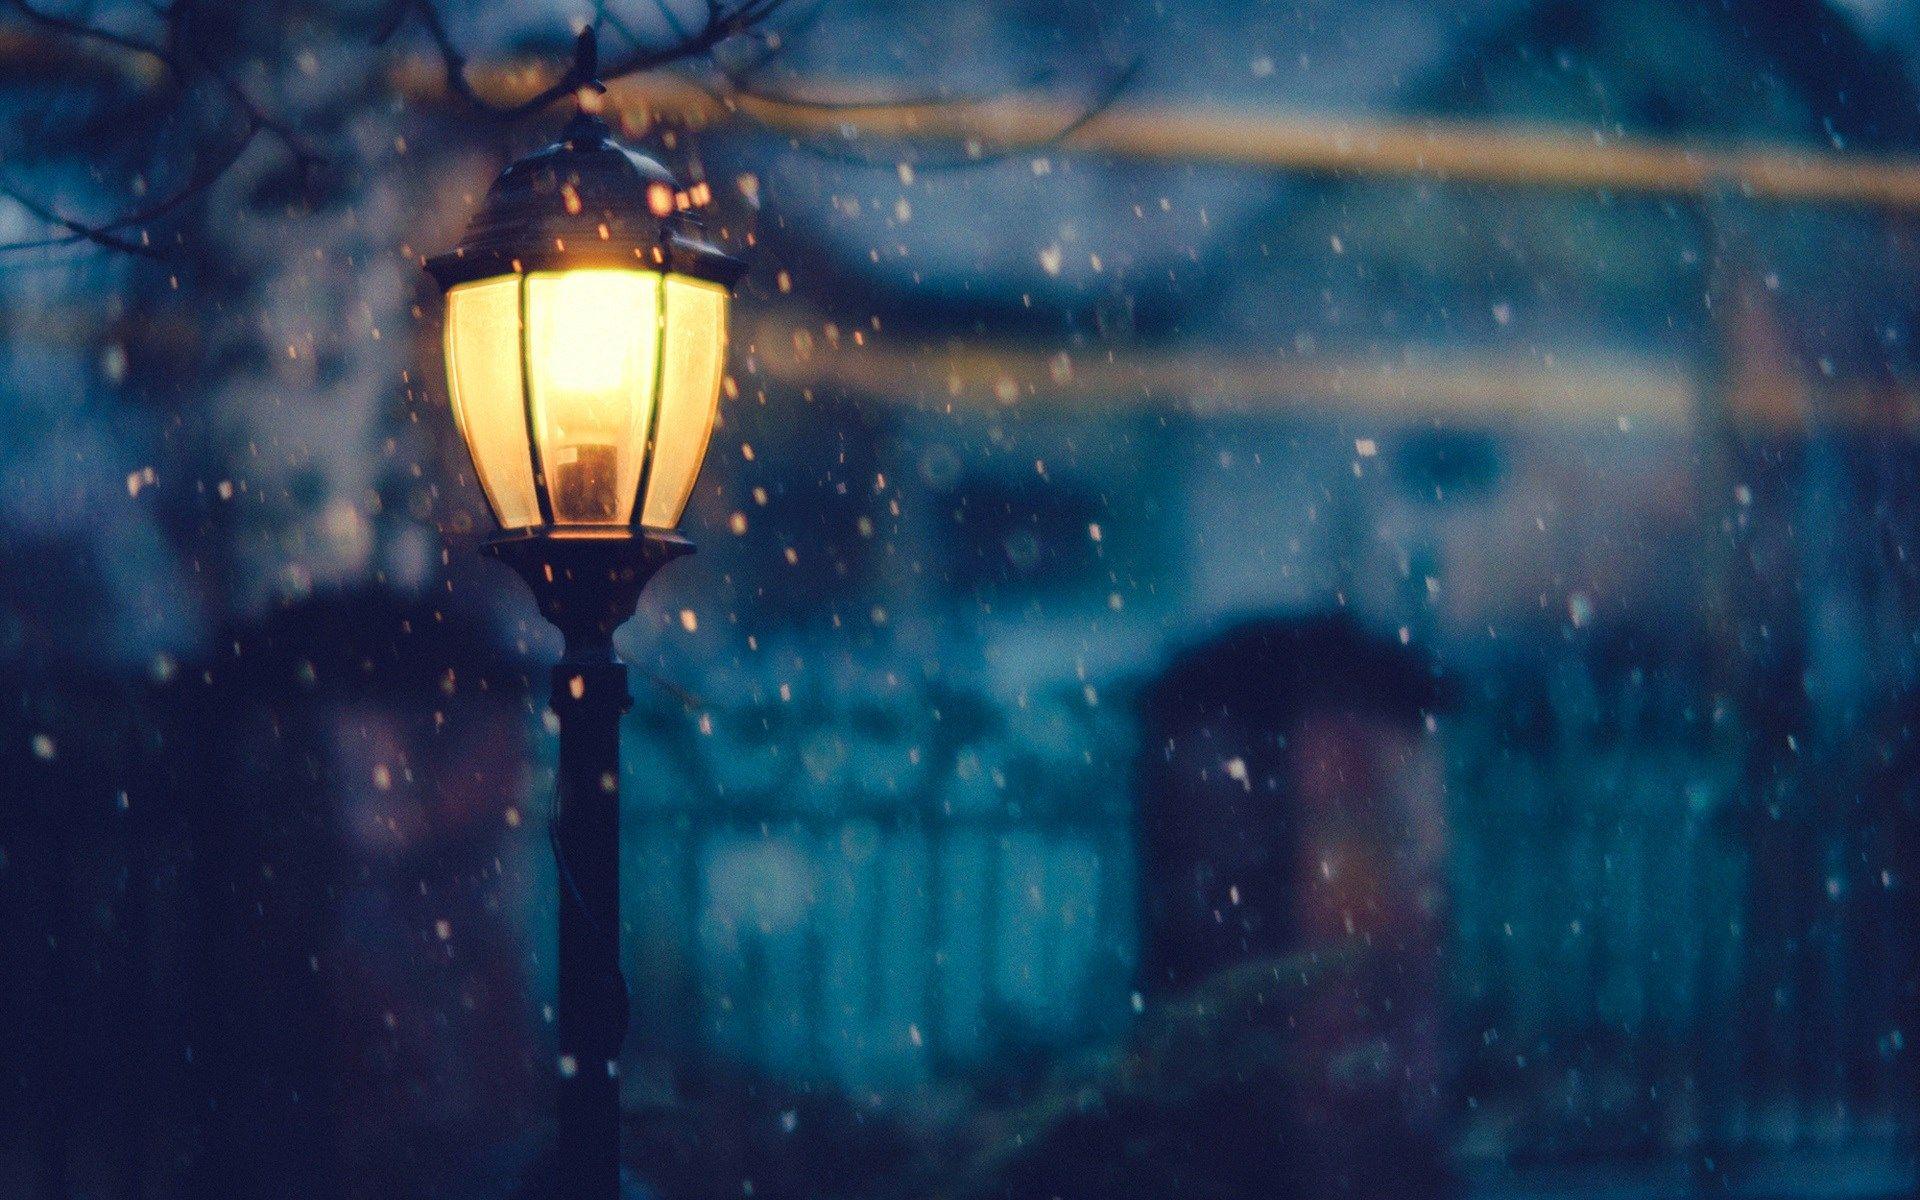 Winter Night Wallpaper Hd Download Free